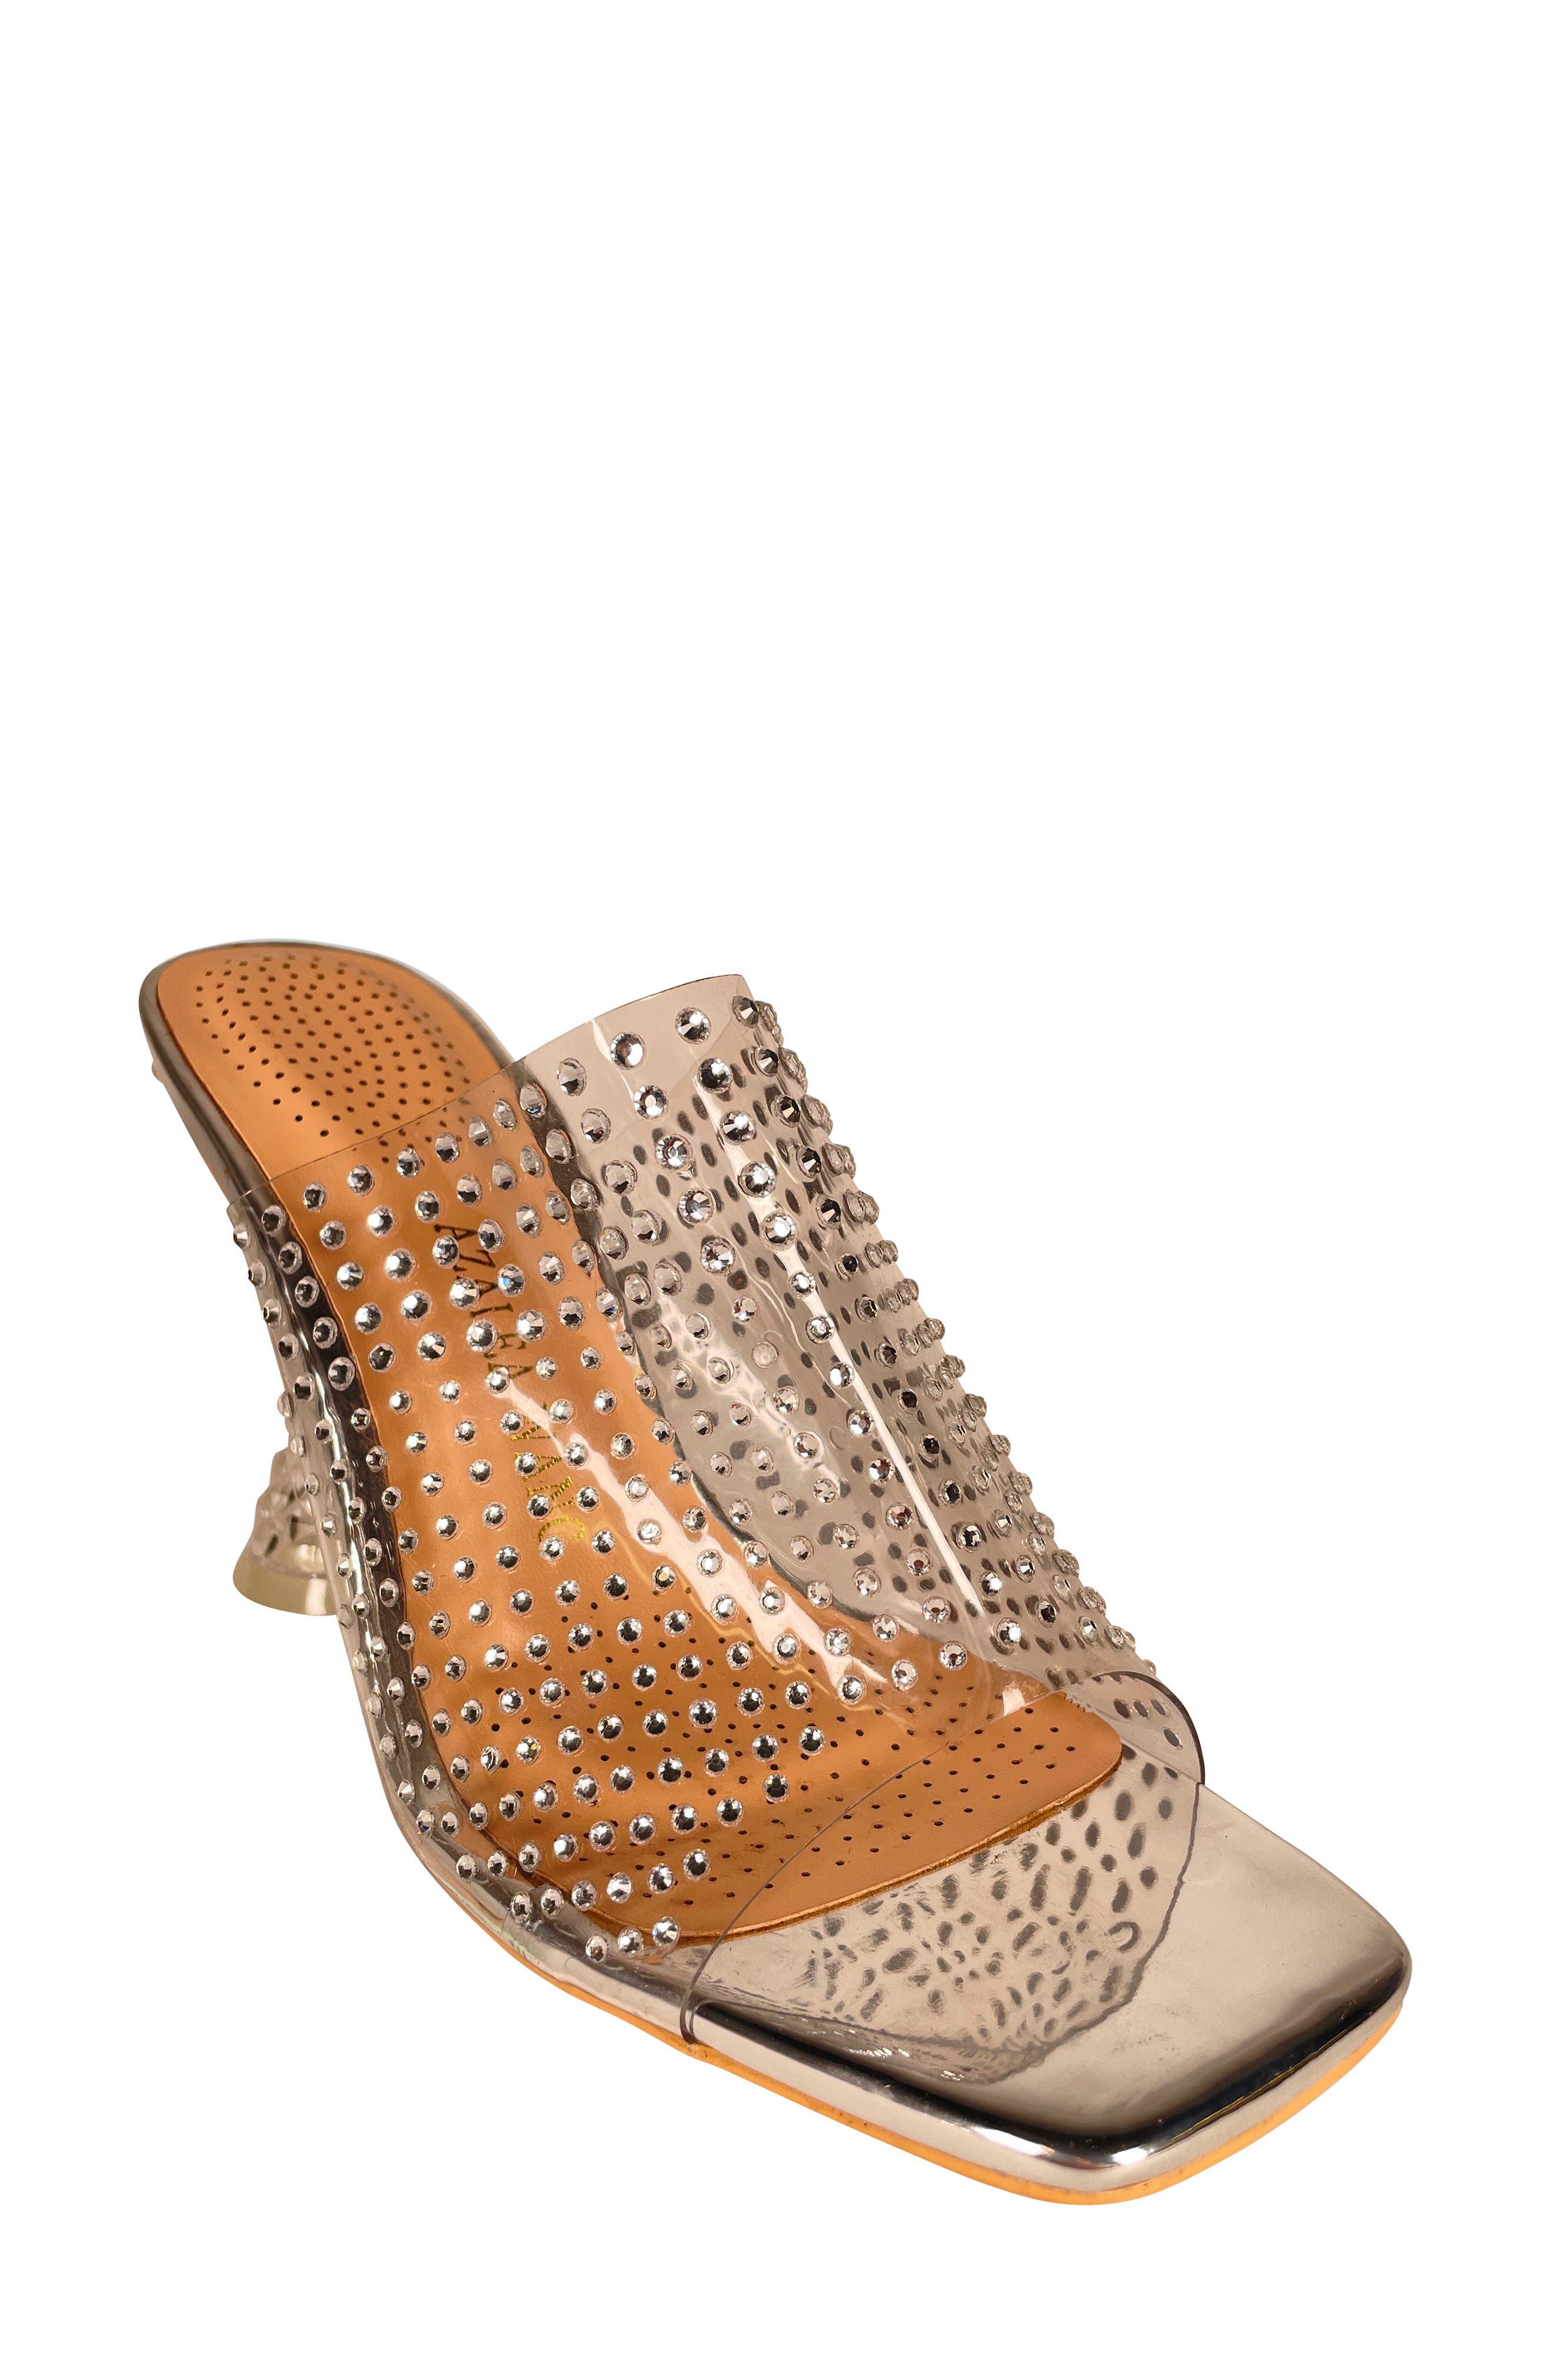 Static Studded Translucent Sandal